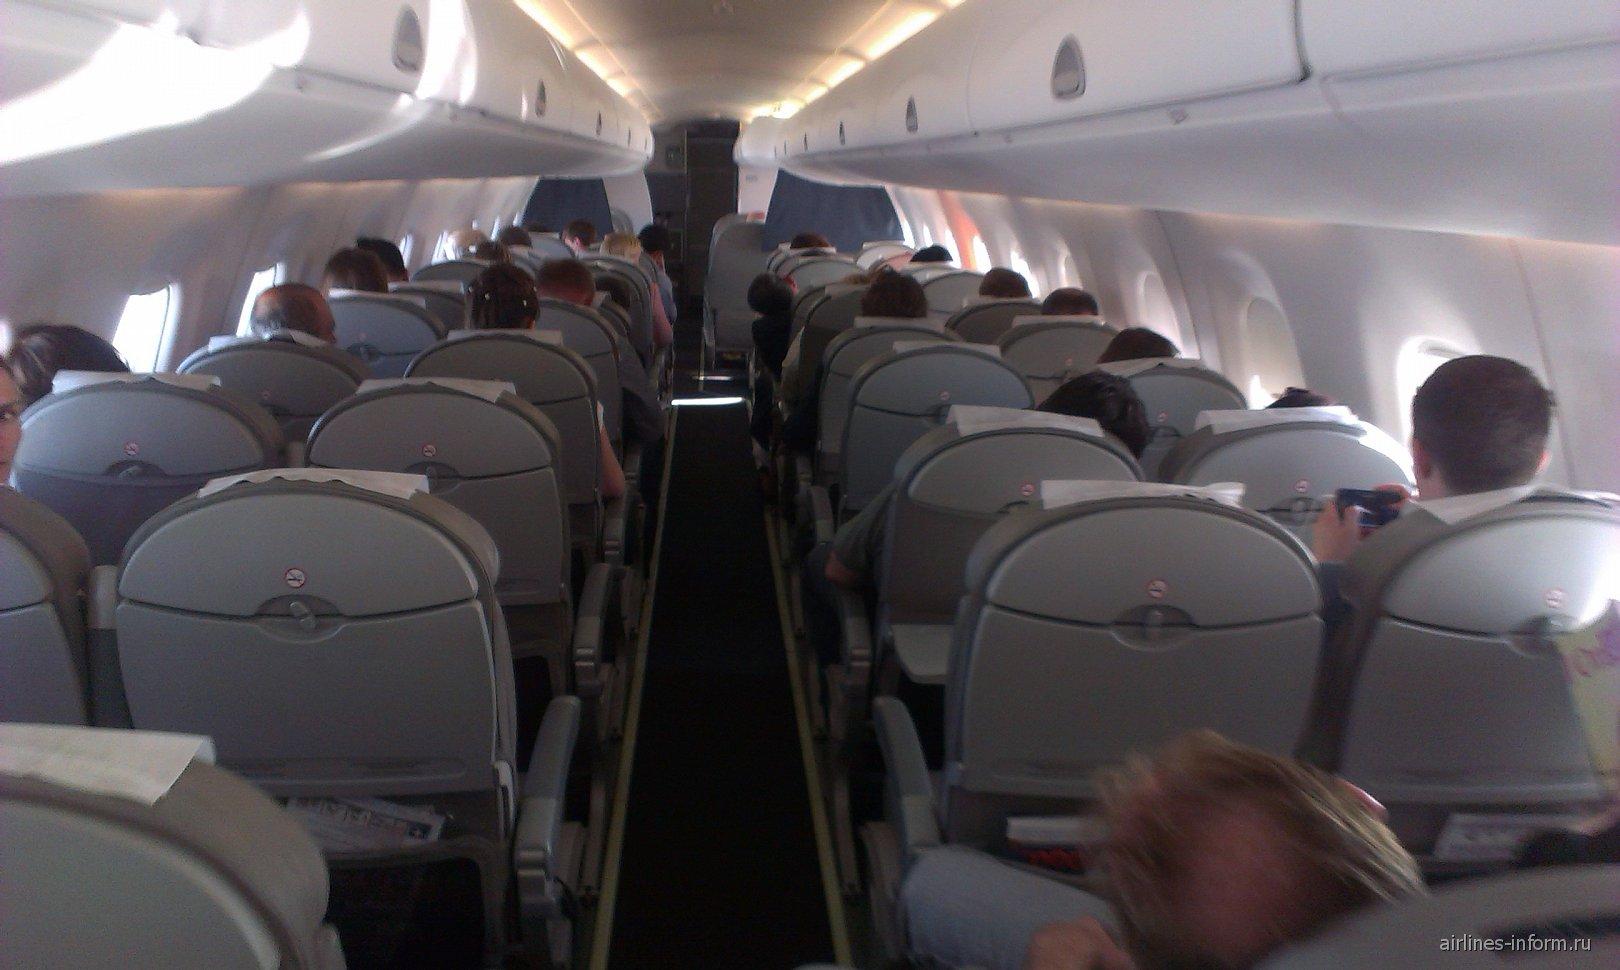 Салон самолета Embraer 170 авиакомпании Белавиа